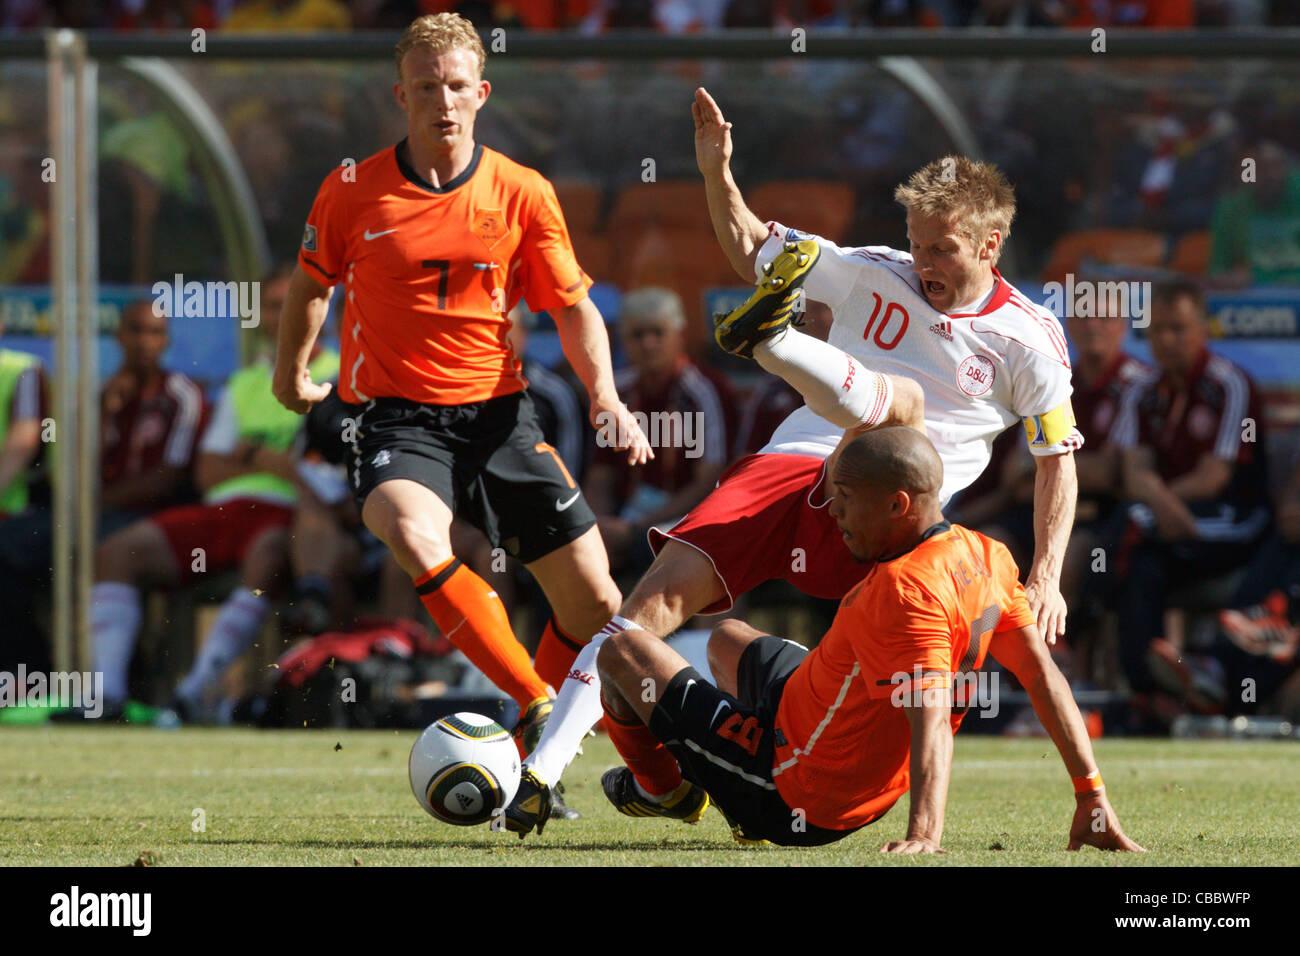 Nigel de Jong of the Netherlands tackles Martin Jorgensen of Denmark (10) during a 2010 FIFA World Cup match. - Stock Image